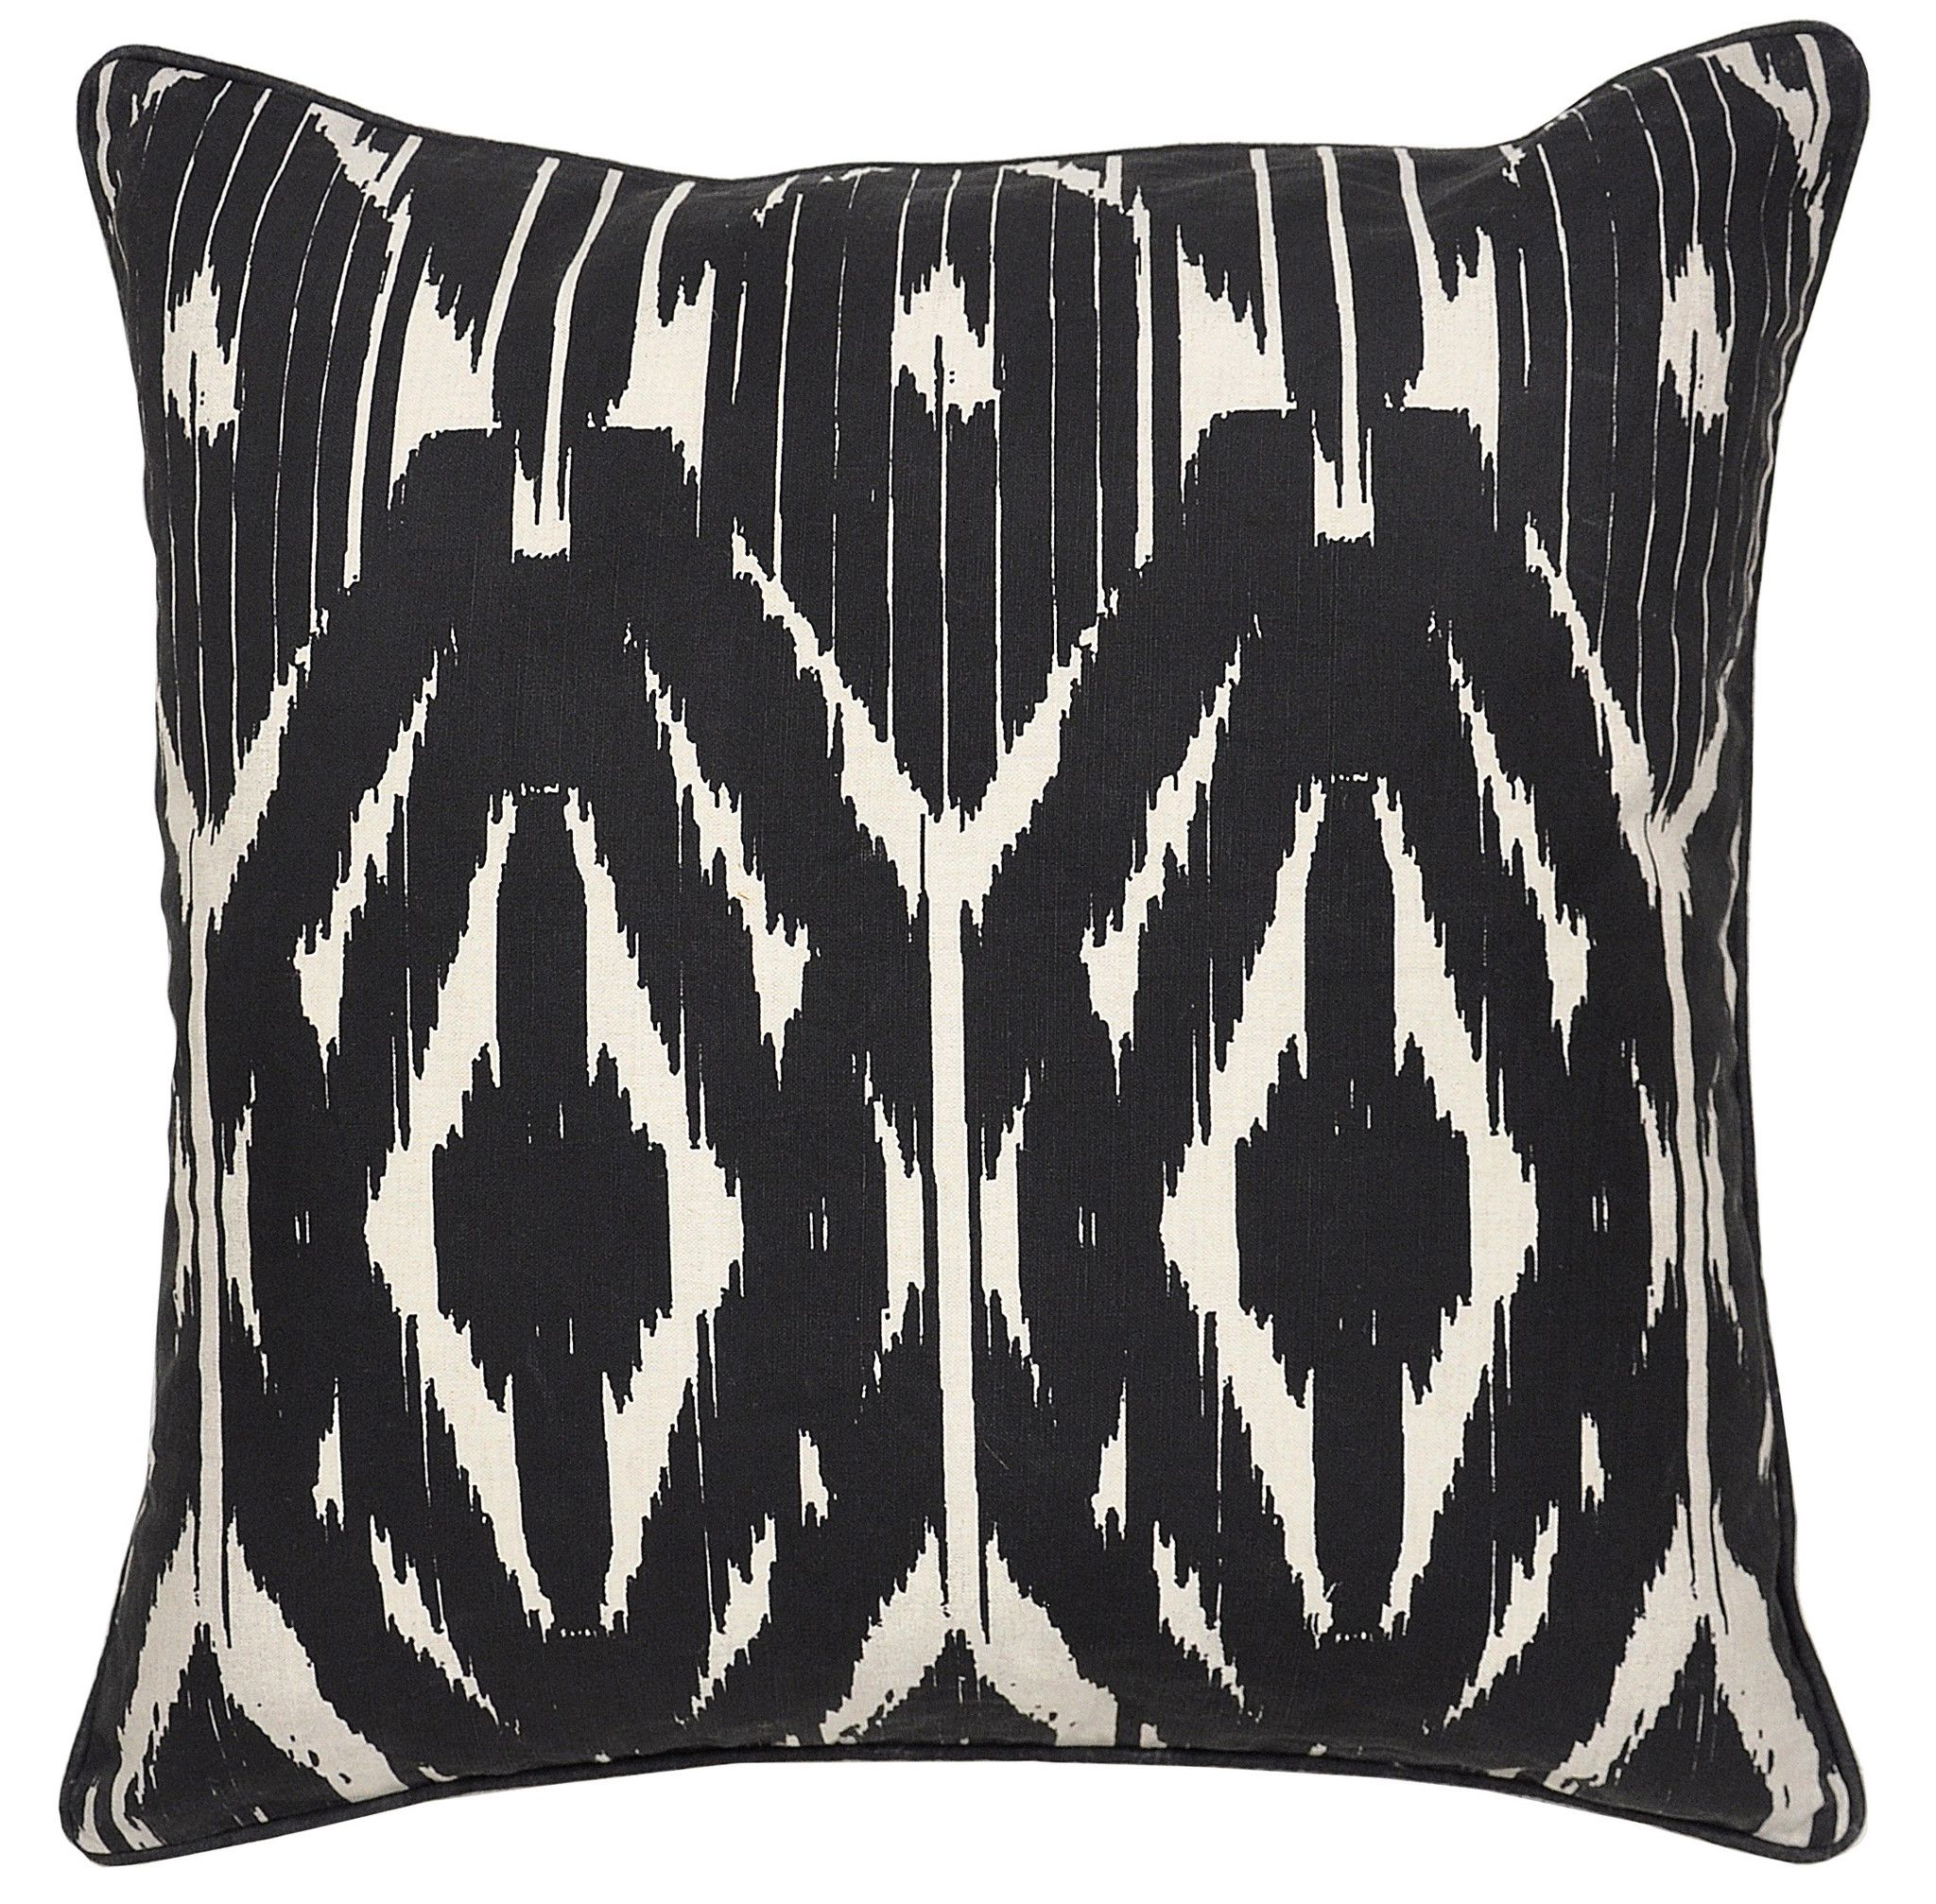 Suri Black Pillow design by Villa Home